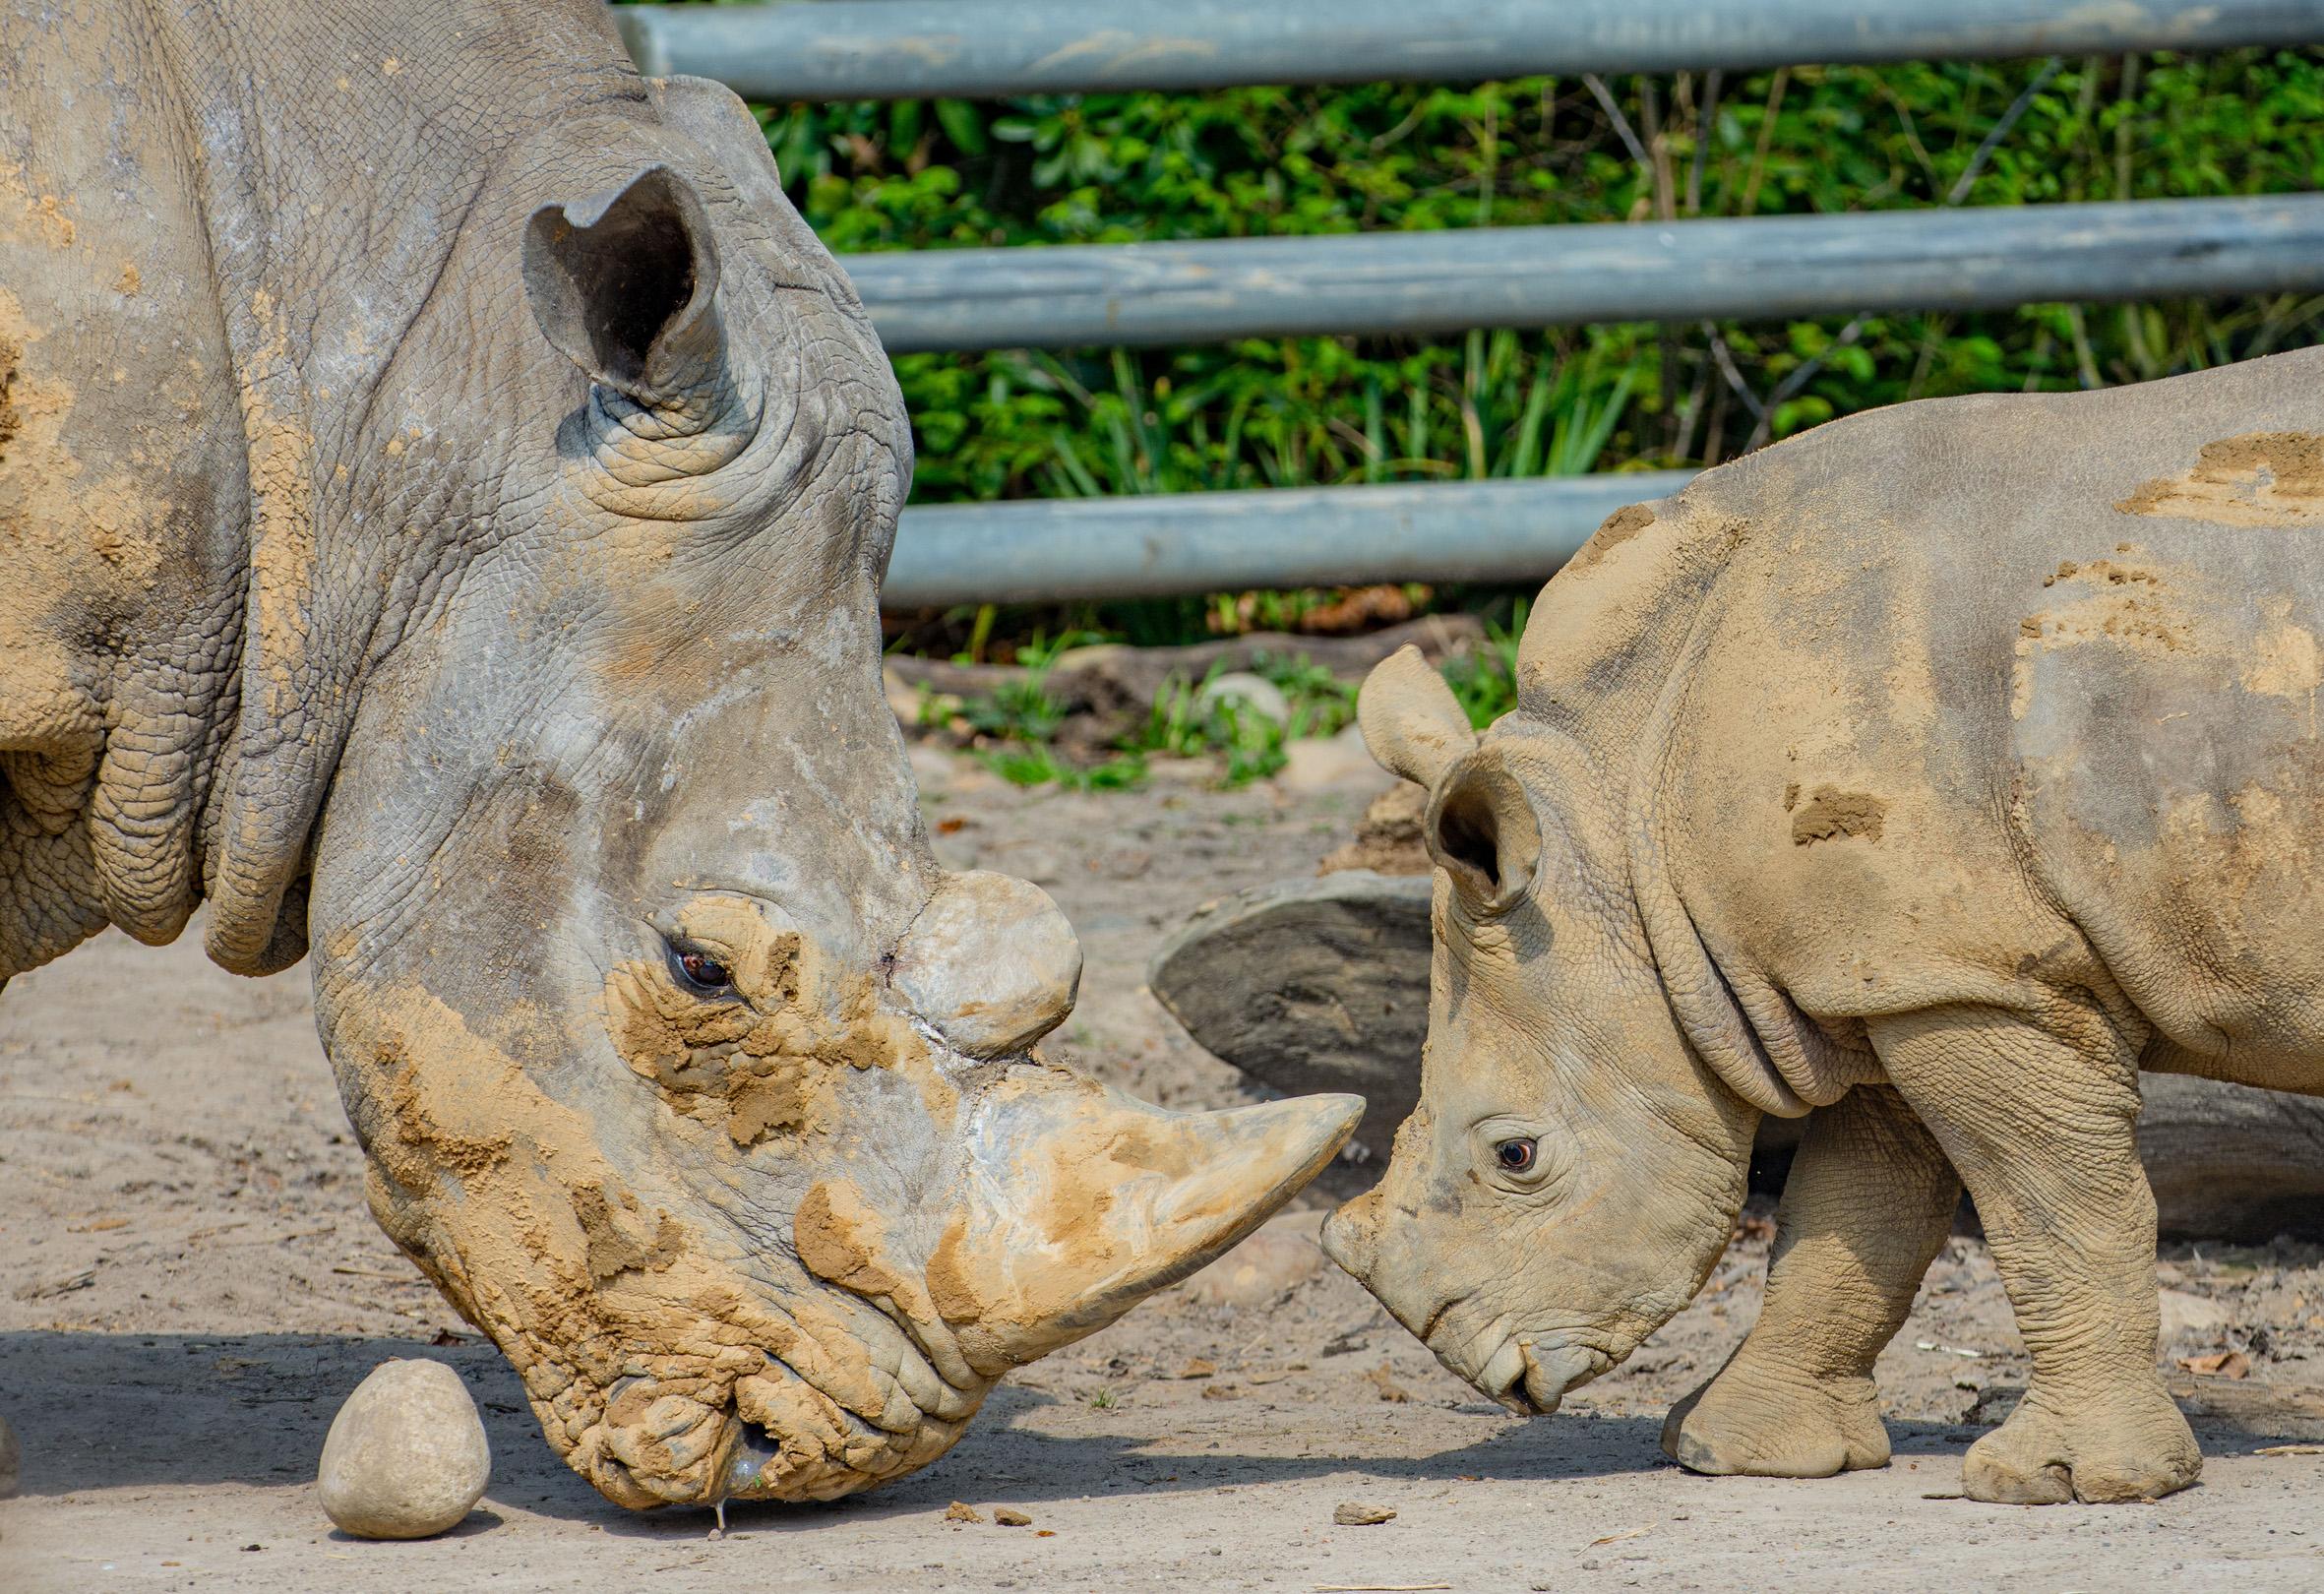 Dortmunder Nashorn-Nachwuchs feiert Geburtstag